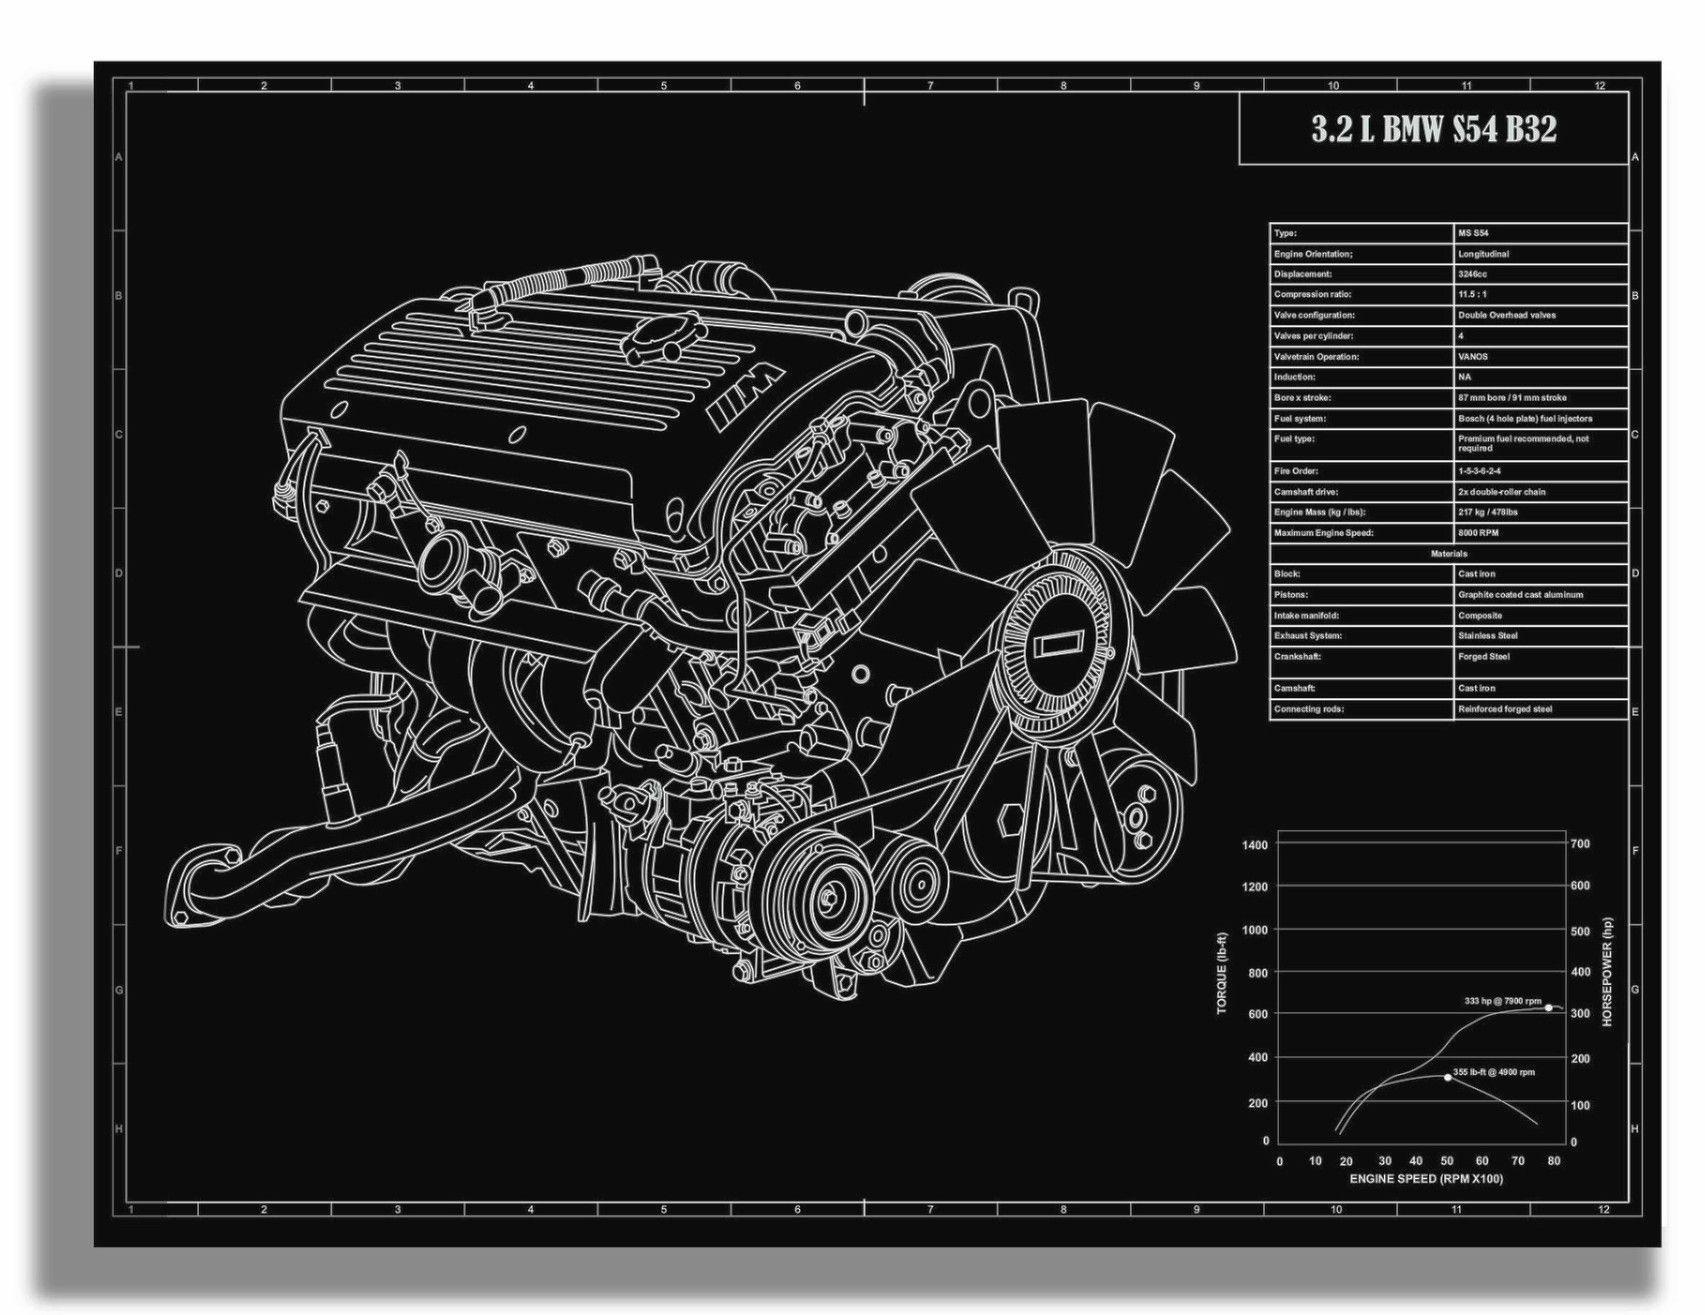 hight resolution of bmw e46 m3 s54 b32 engine engine bmw bmw cars bmw e46 2002 bmw e46 s54 m3 wiring diagram